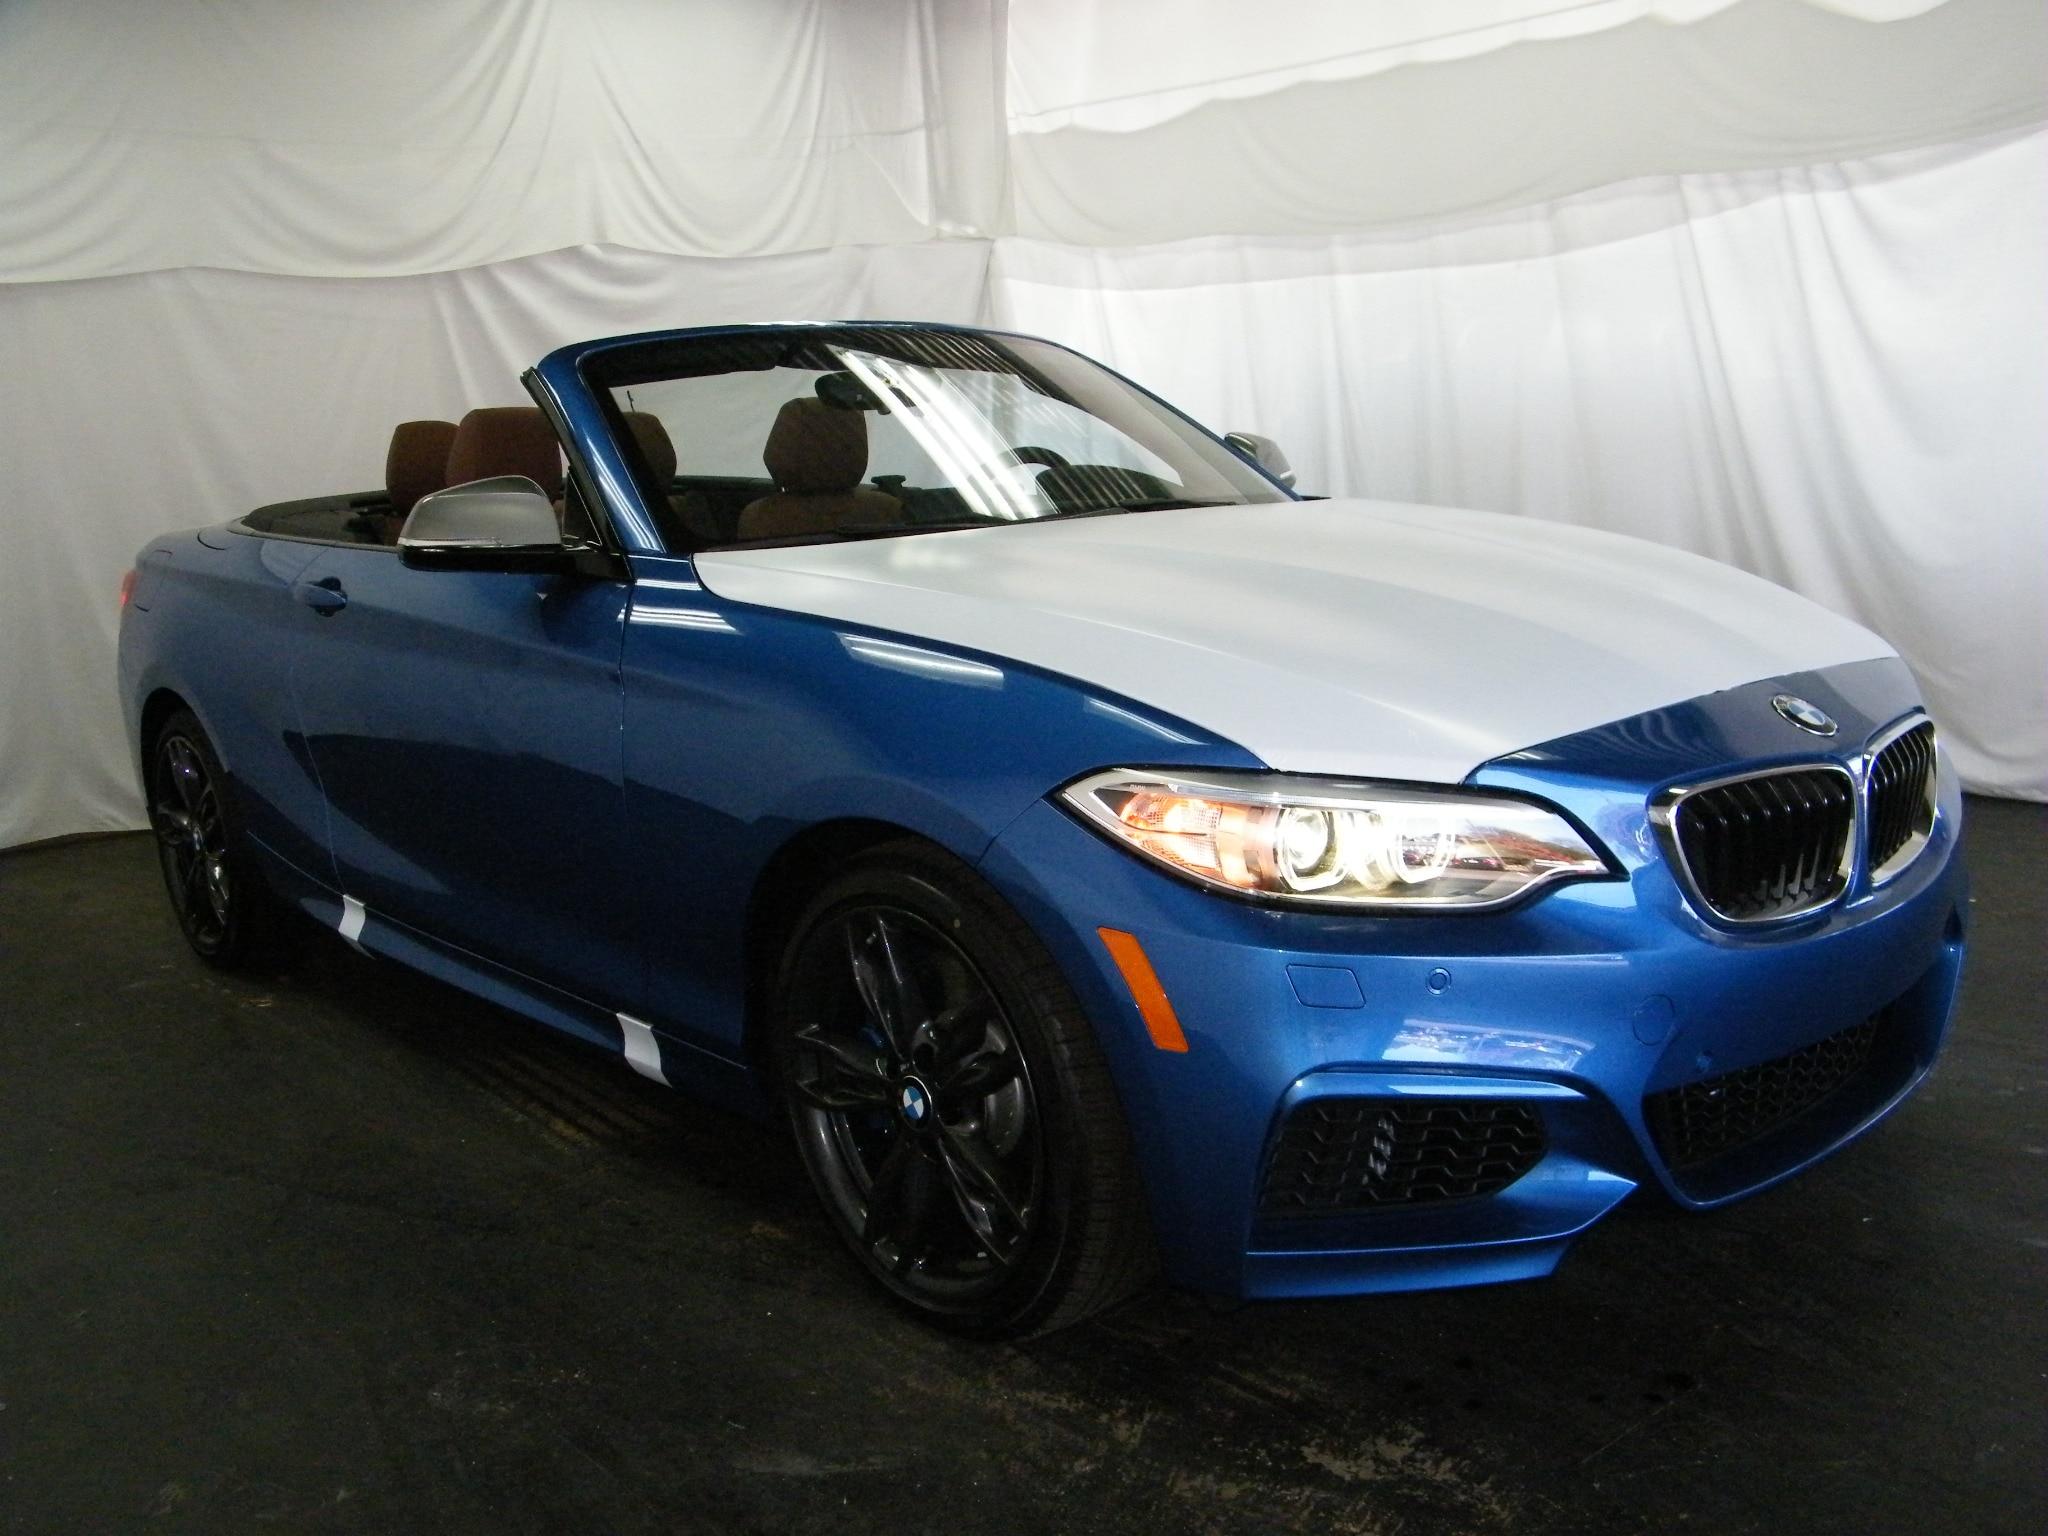 New 2016 BMW M, $58420